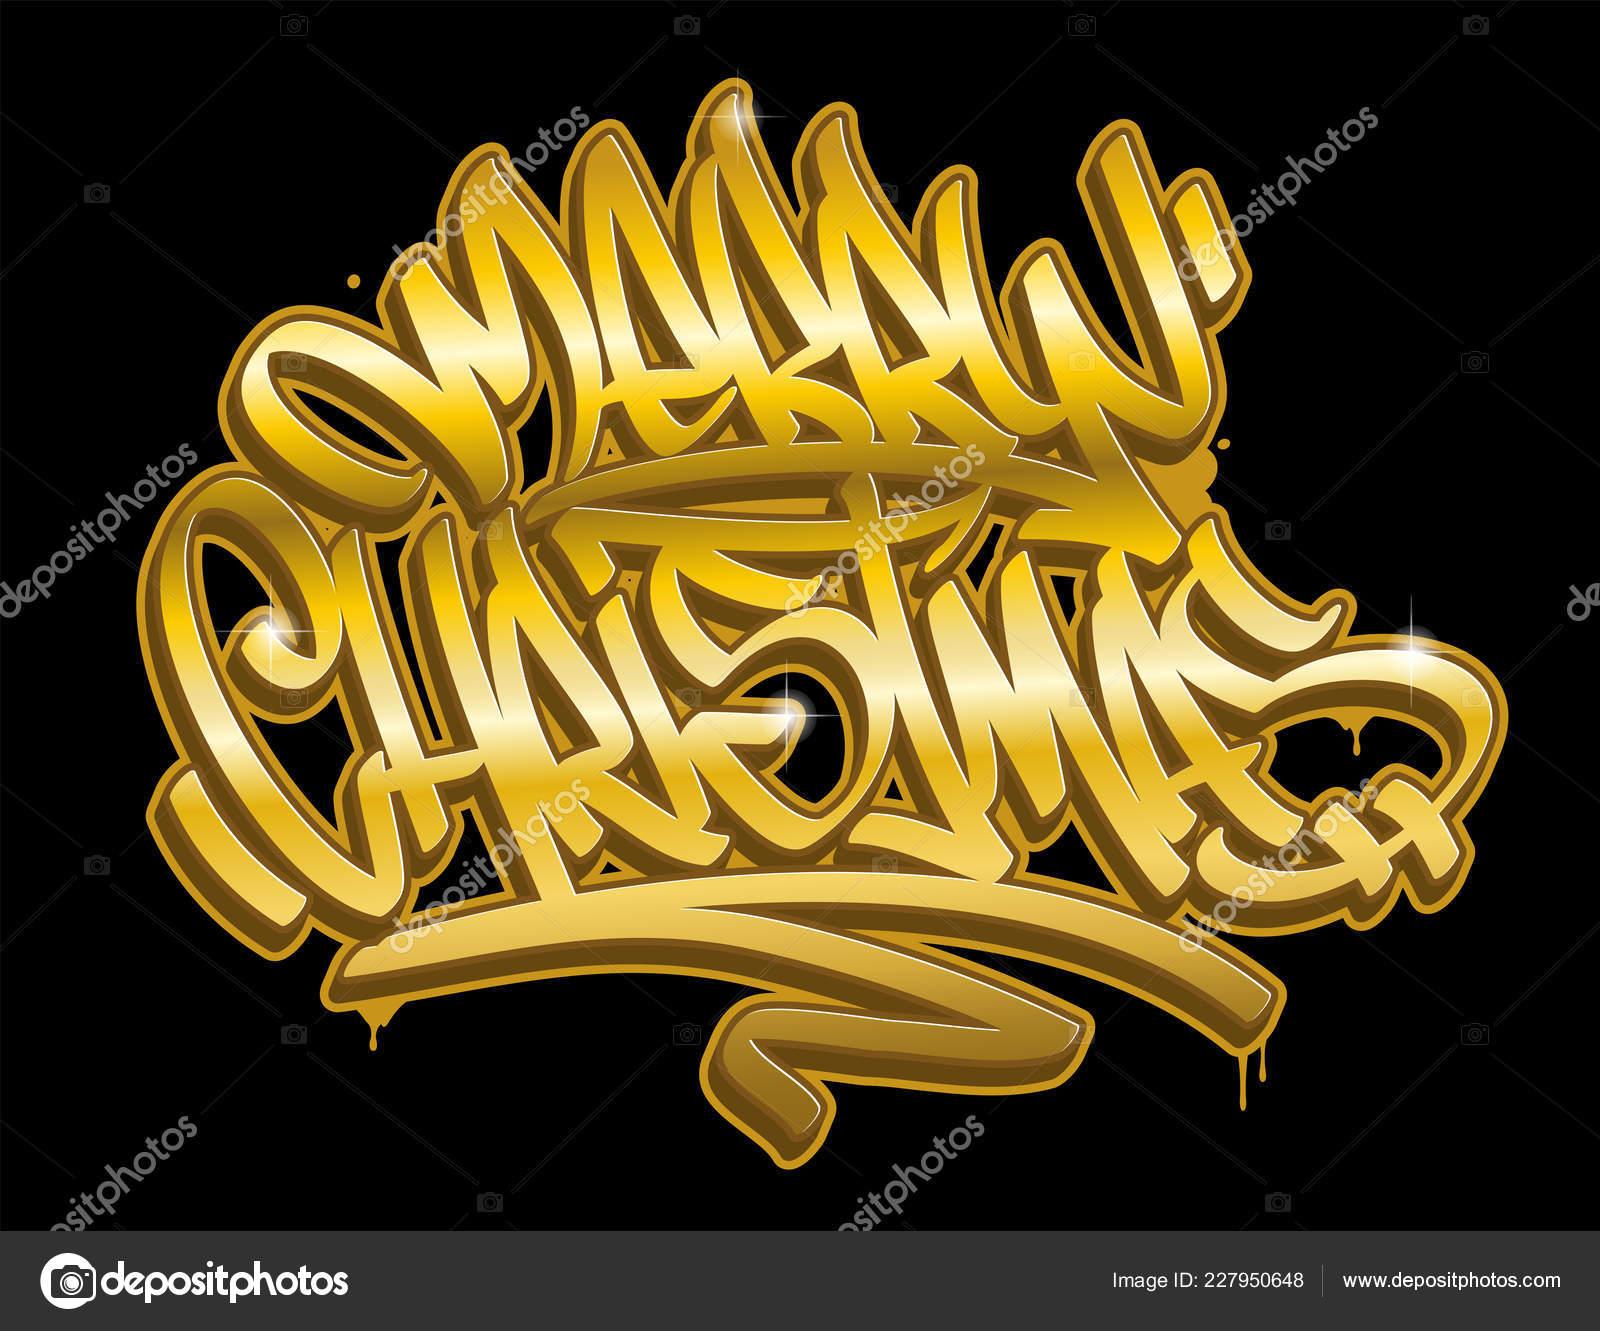 Christmas Graffiti Background.Merry Christmas Lettering Greeting Card Graffiti Style